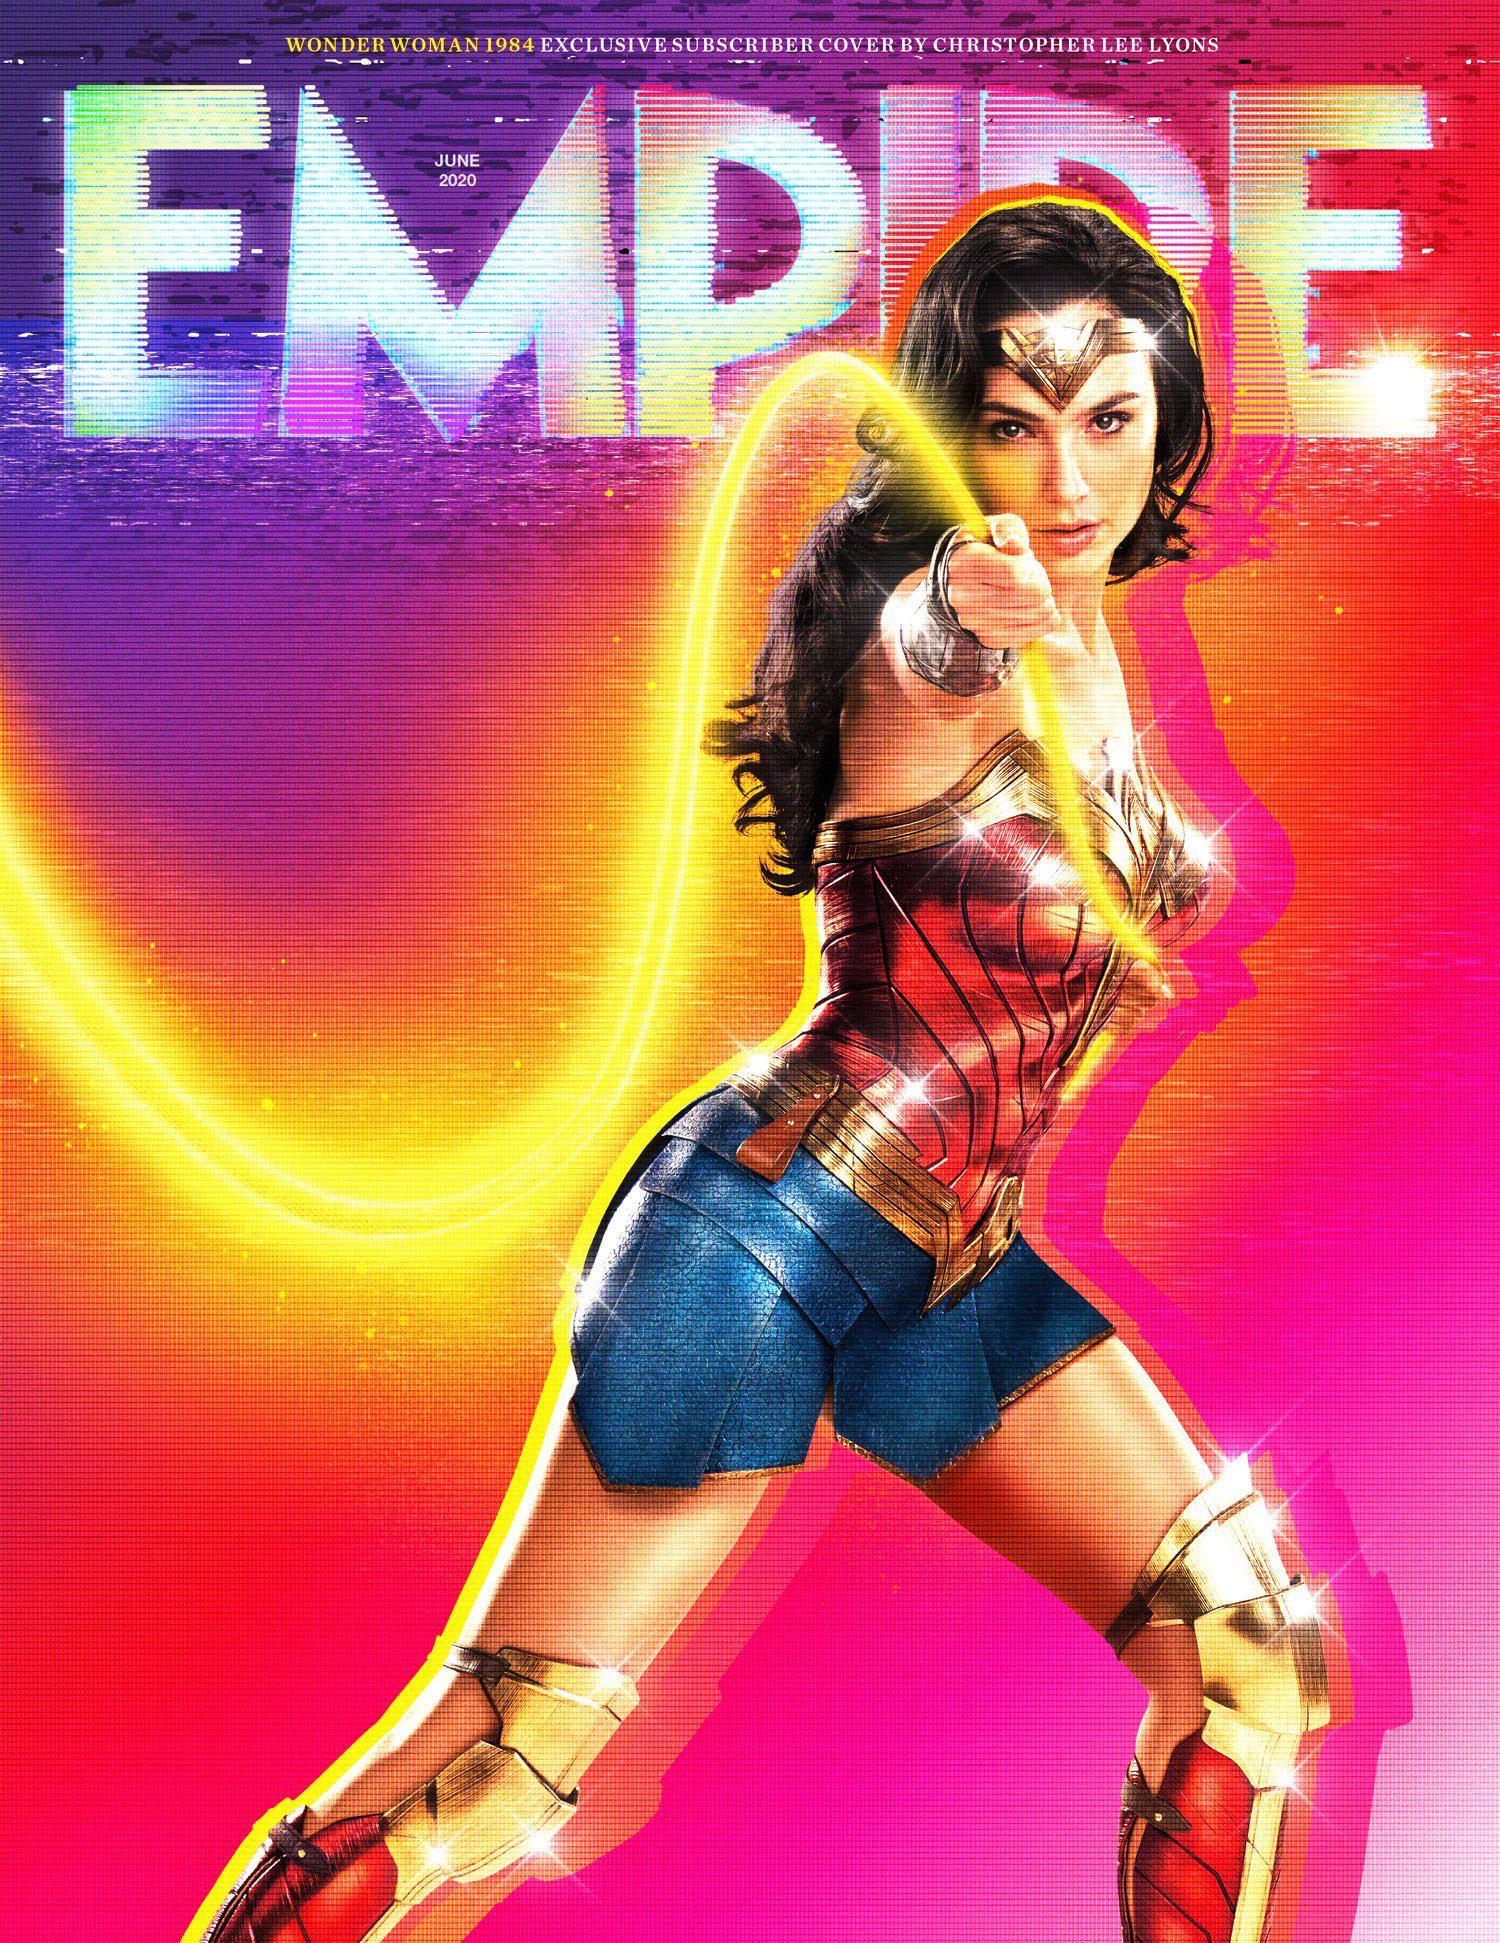 wonder-woman-1984-empire-subscriber-cove